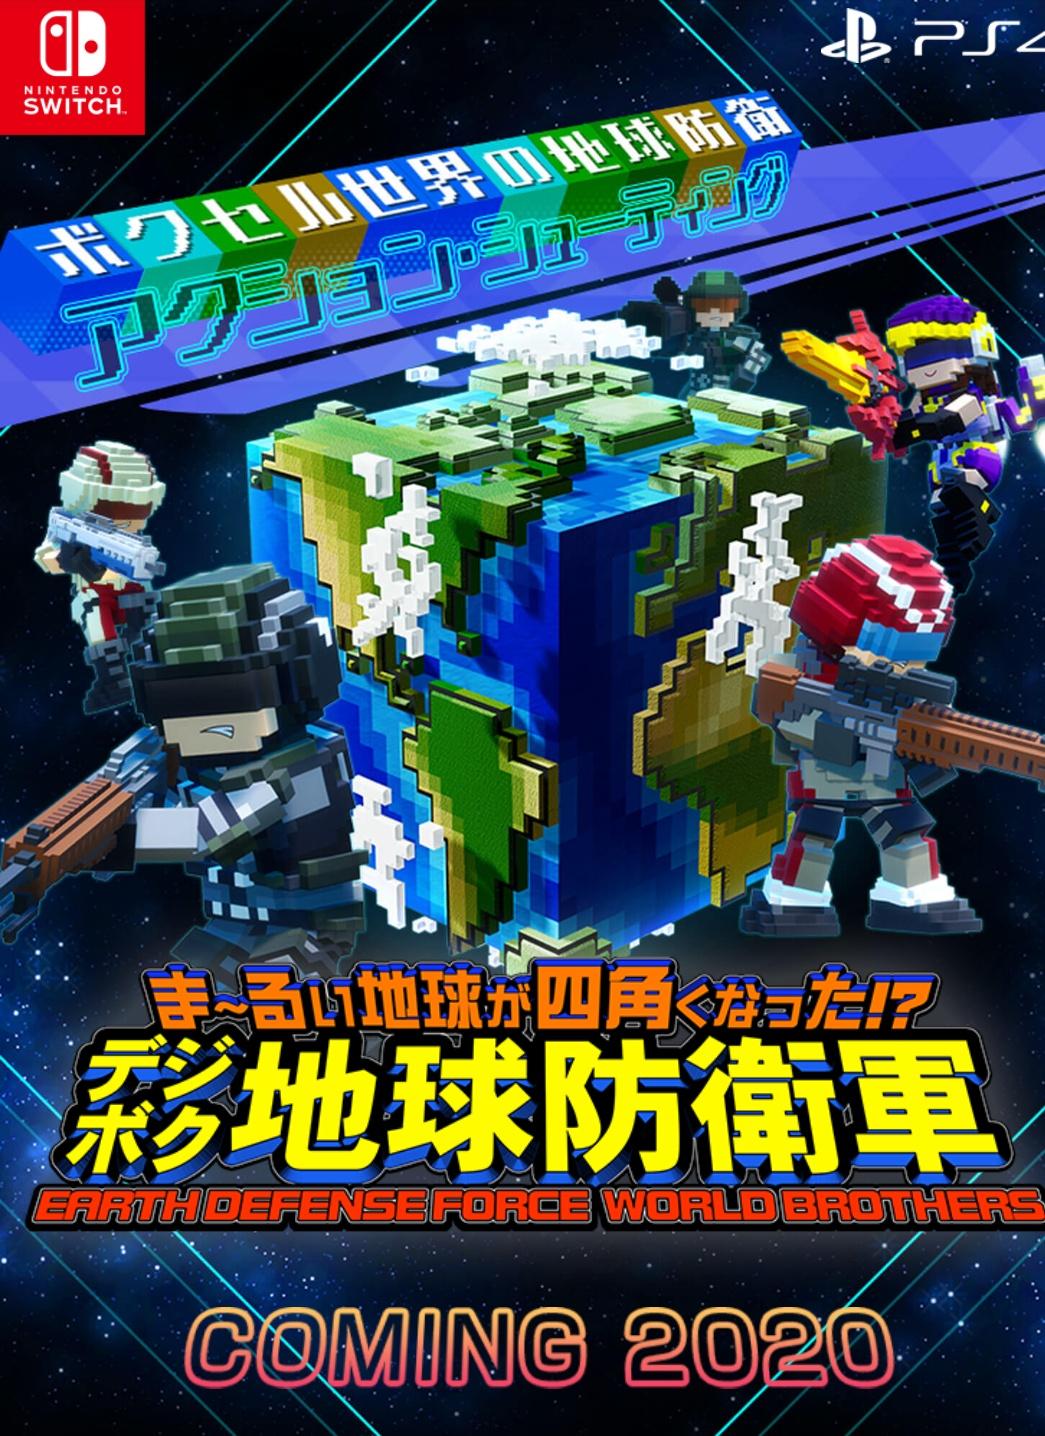 01Qz53C - 【EDF6】PS4/Swichに地球防衛軍の新作が登場!